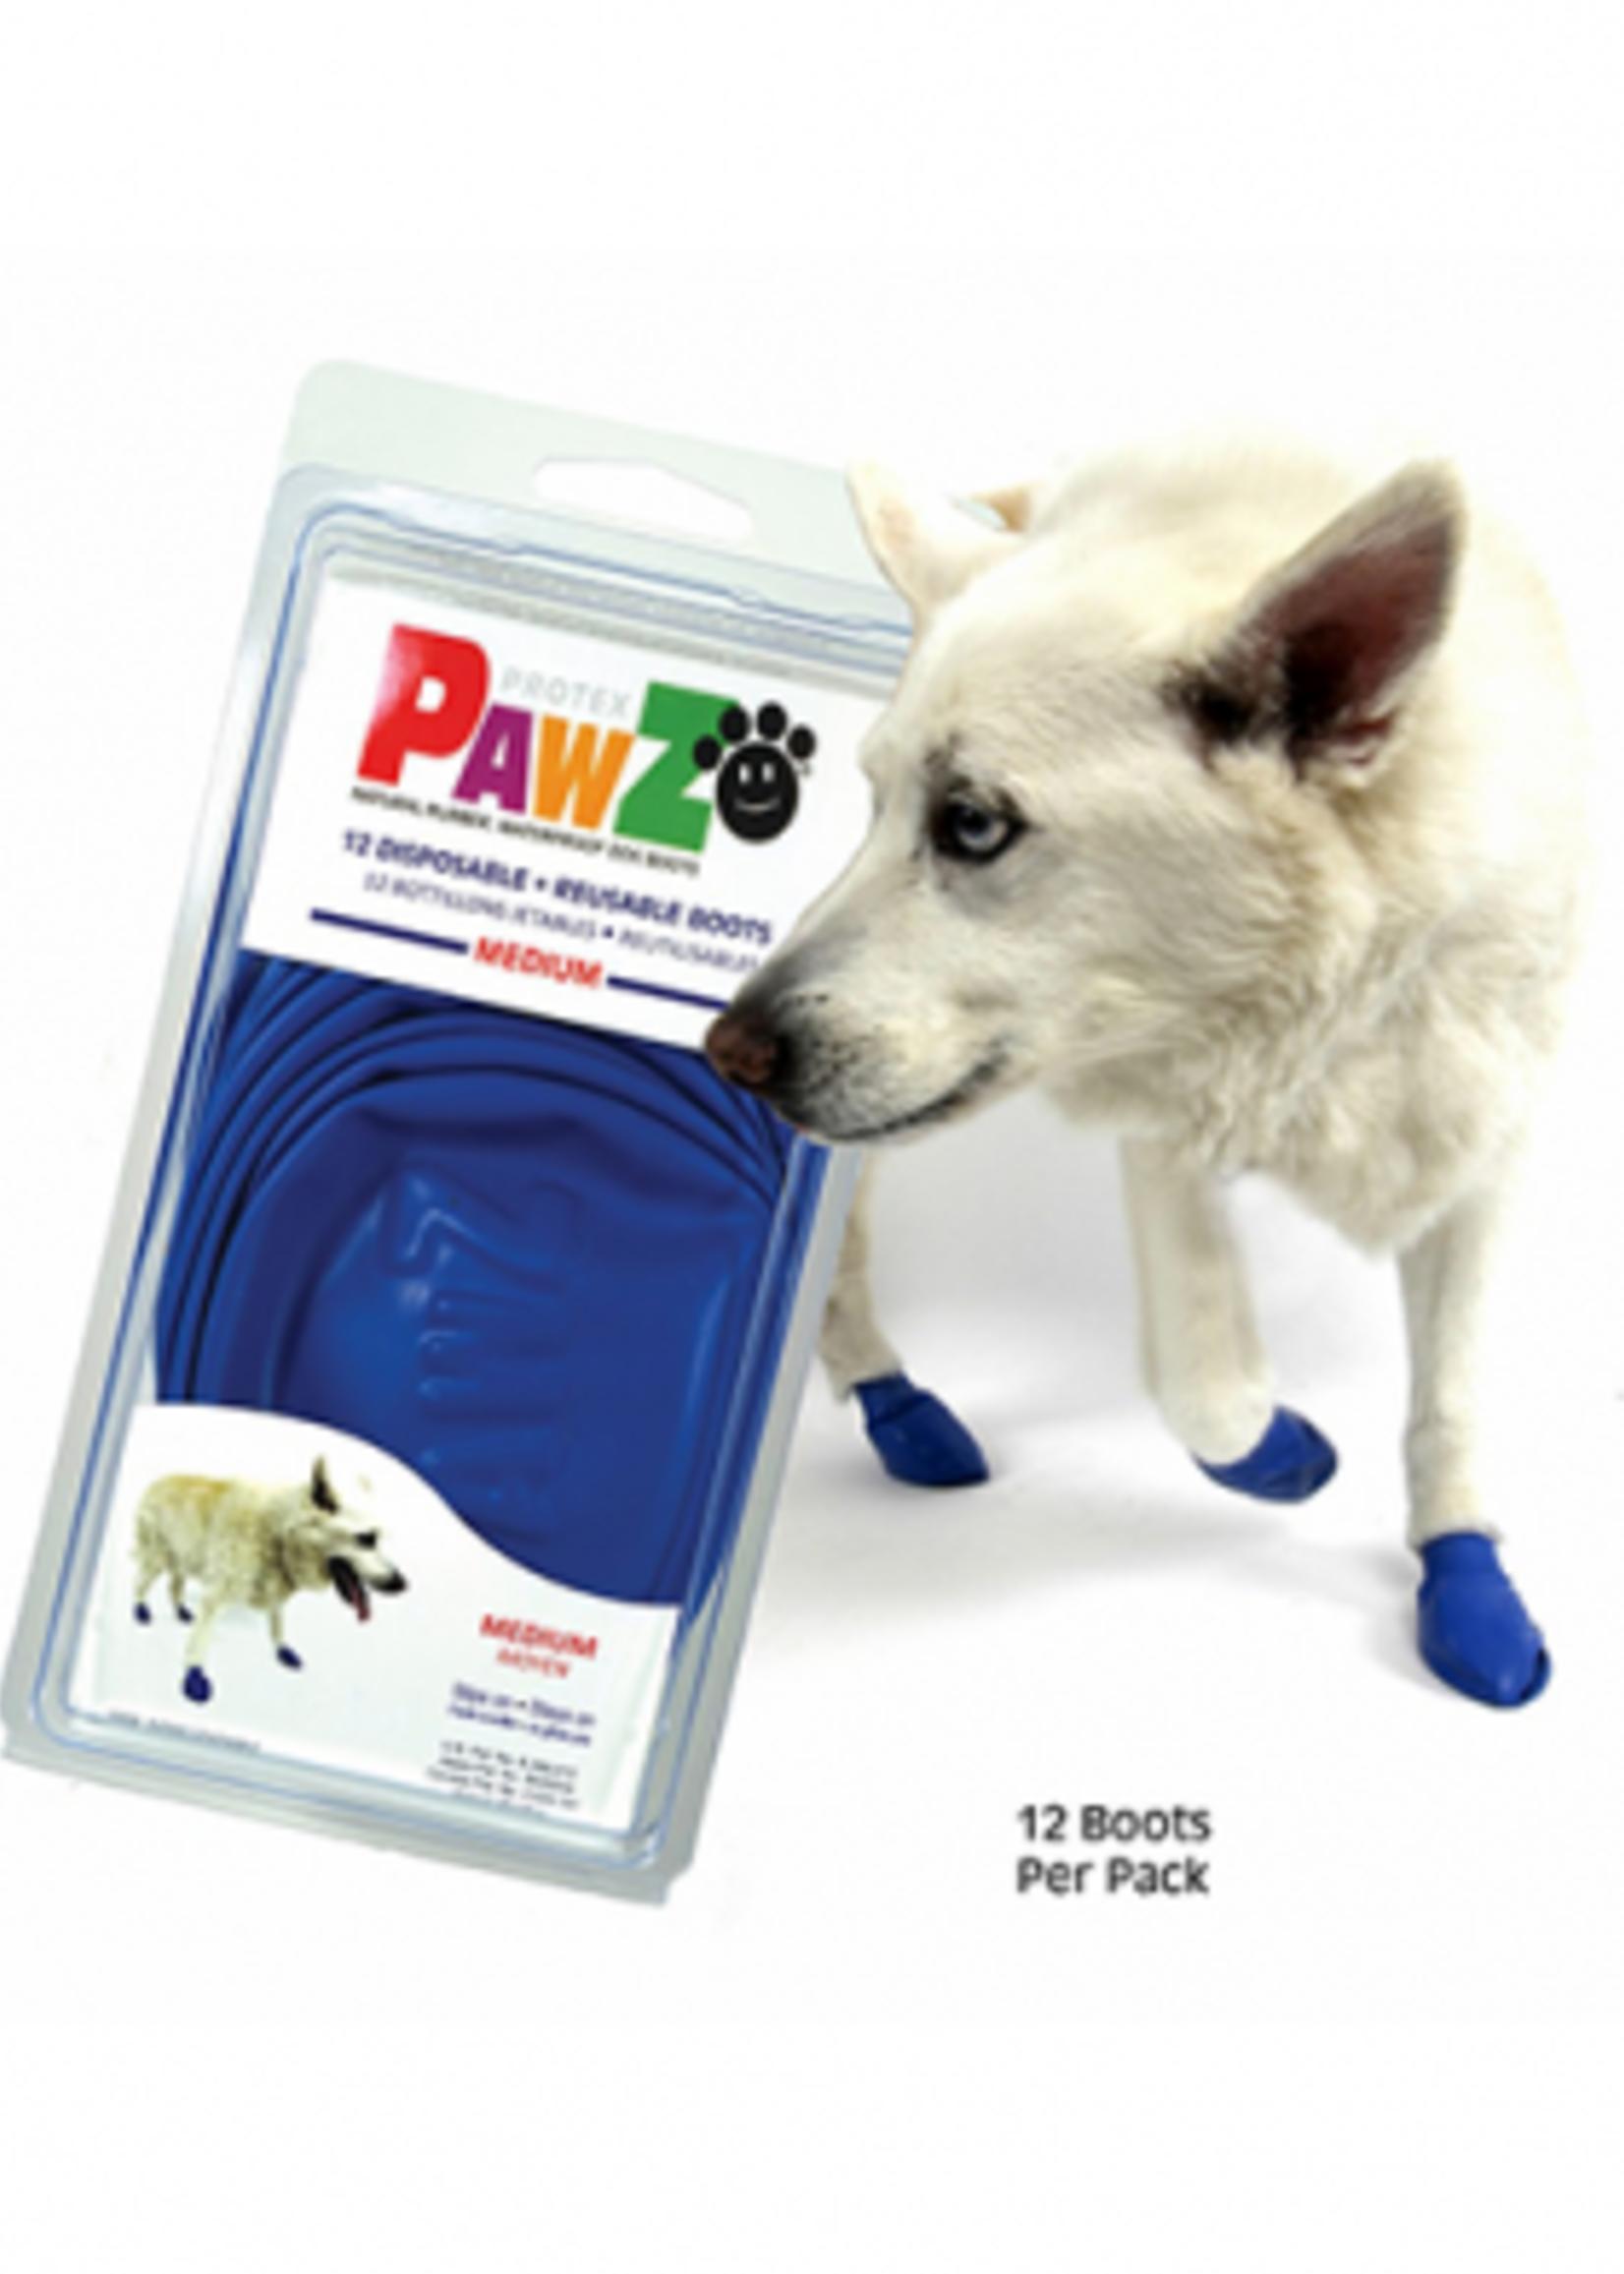 PAWZ PAWZ RUBBER DOG BOOTS BLUE Mdm 12pk